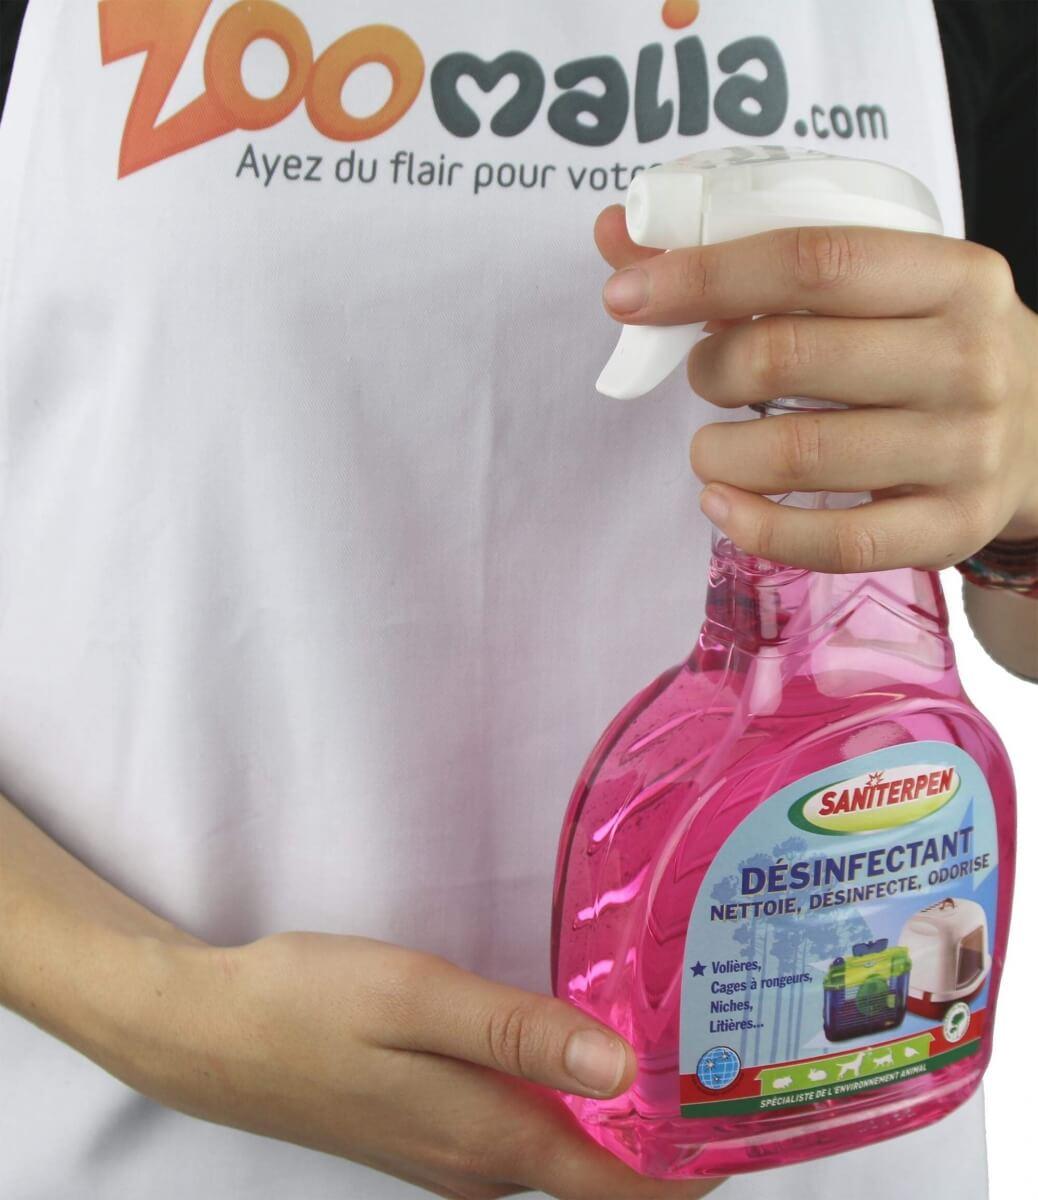 d sinfectant spray saniterpen 750 ml nettoyage odeurs chat. Black Bedroom Furniture Sets. Home Design Ideas